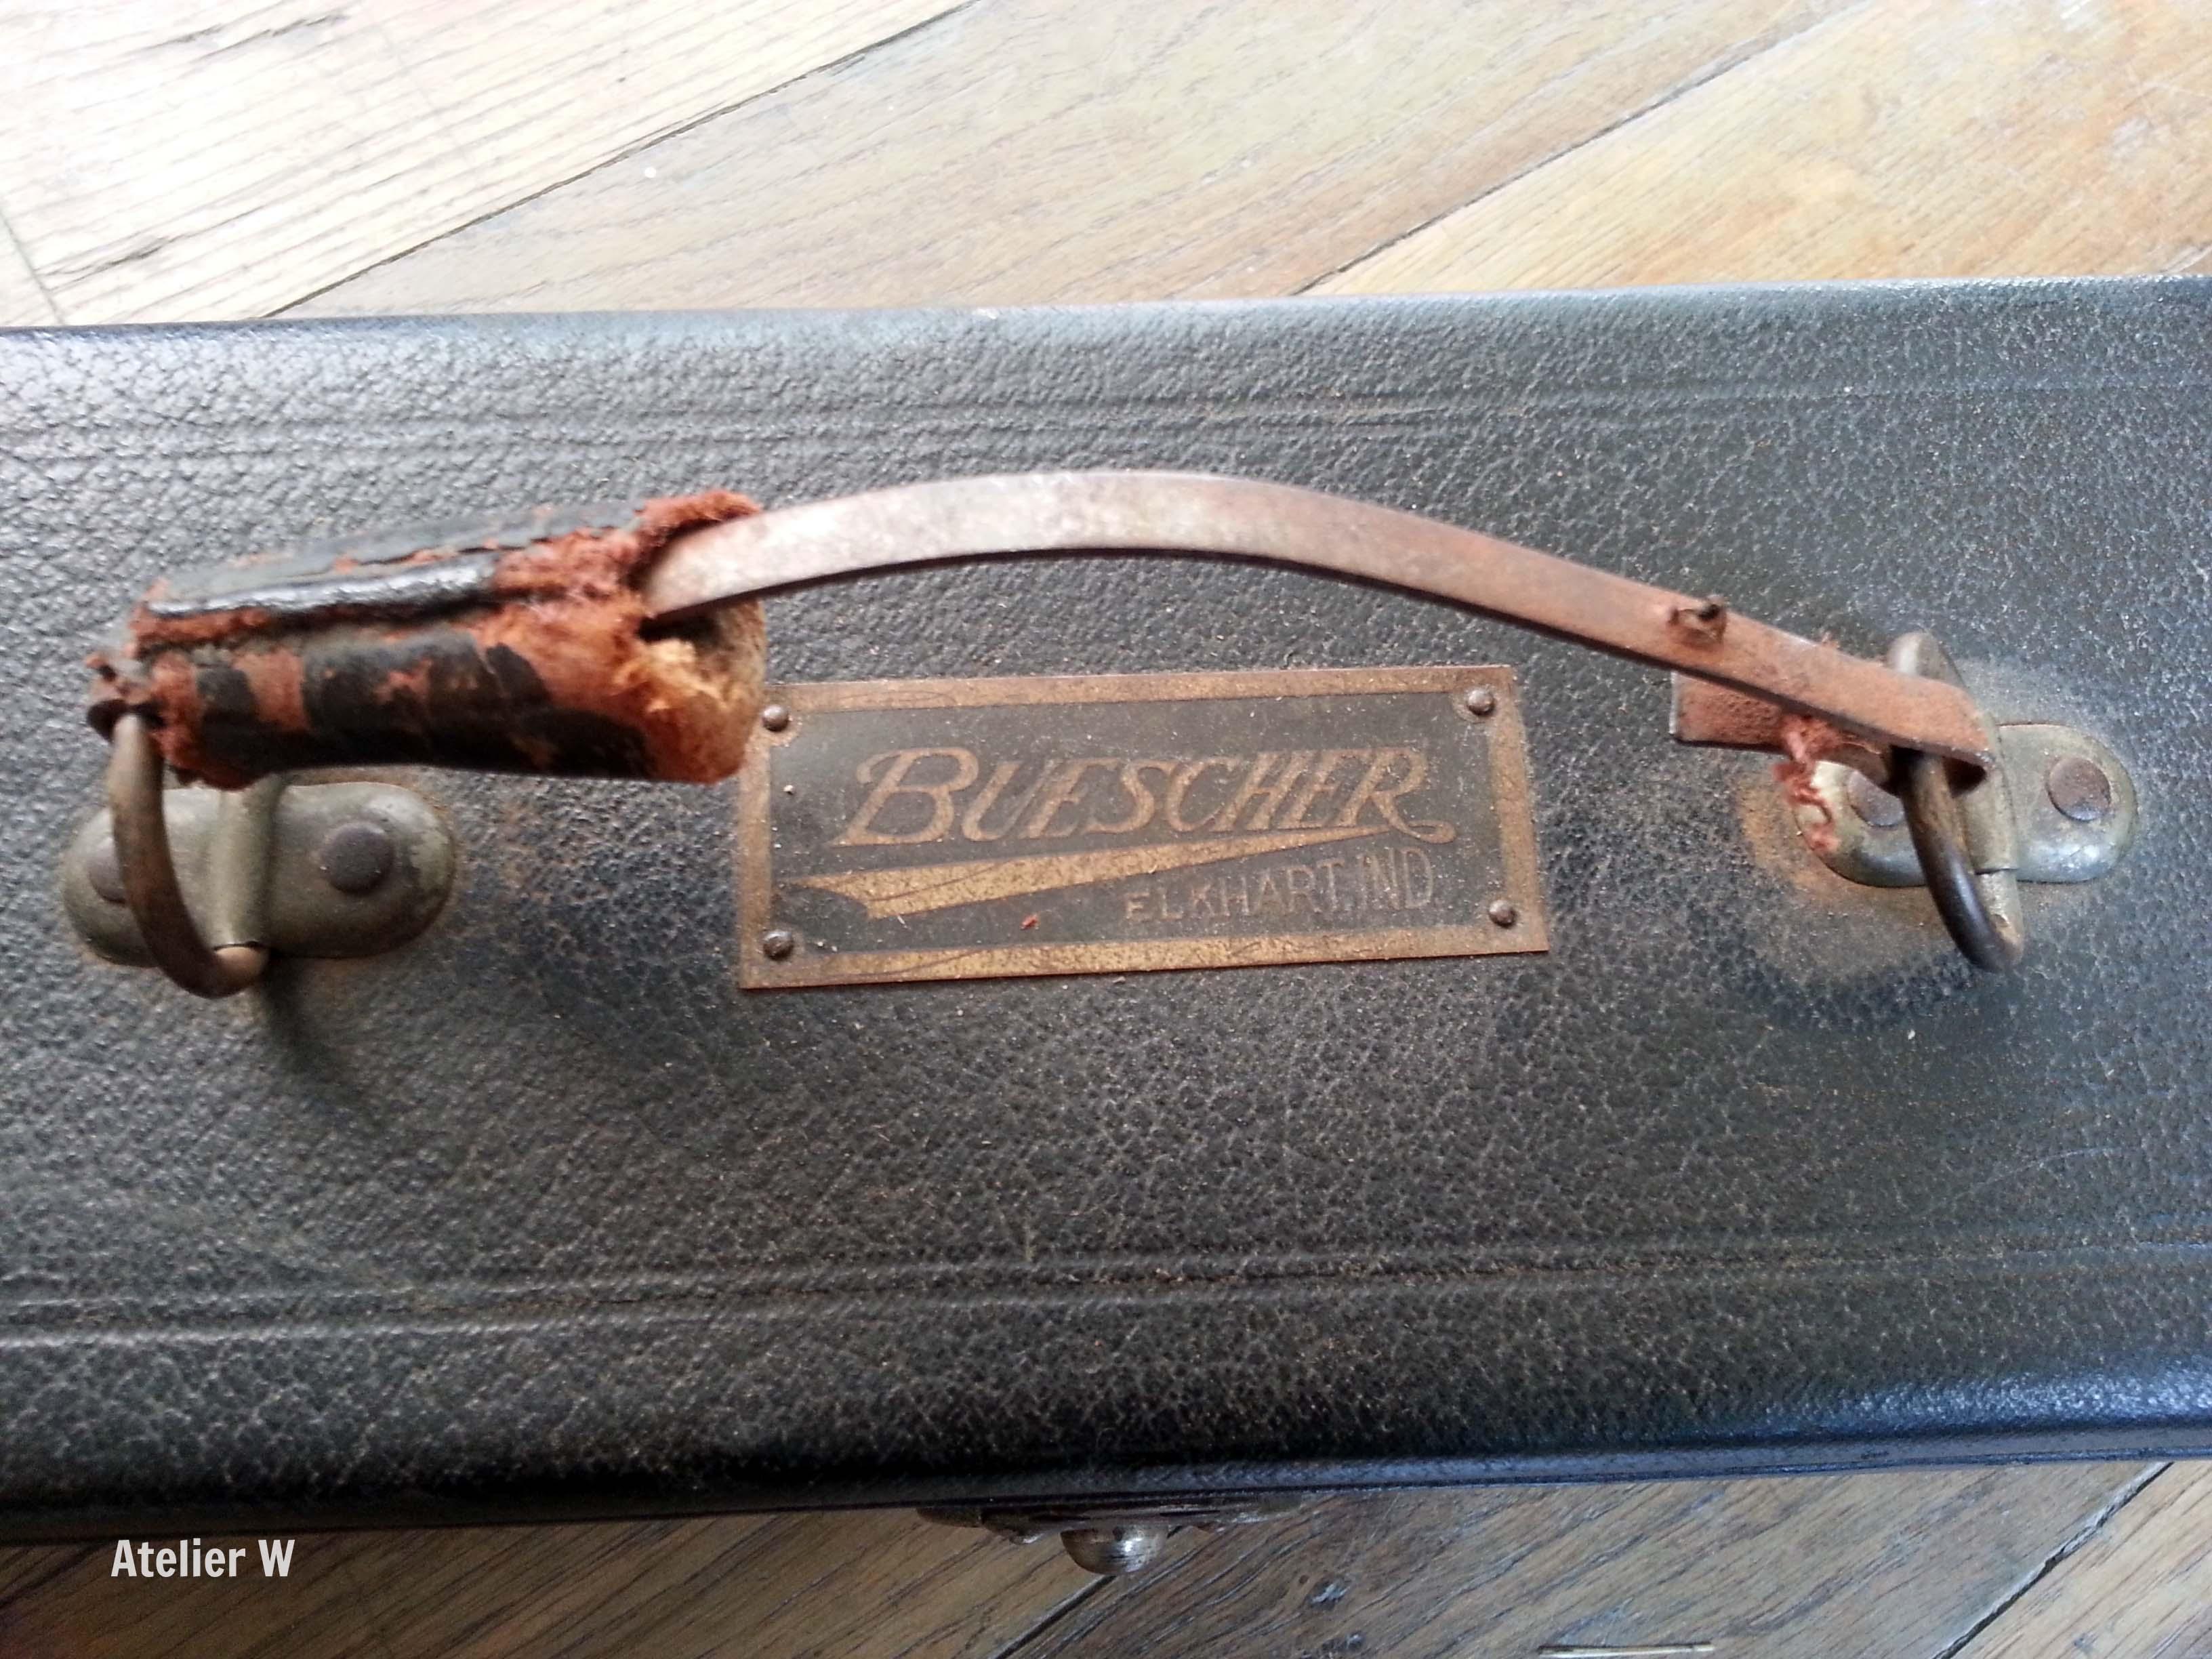 Soprano Buescher True Tone 1924: le dernier instrument de Sidney Bechet!